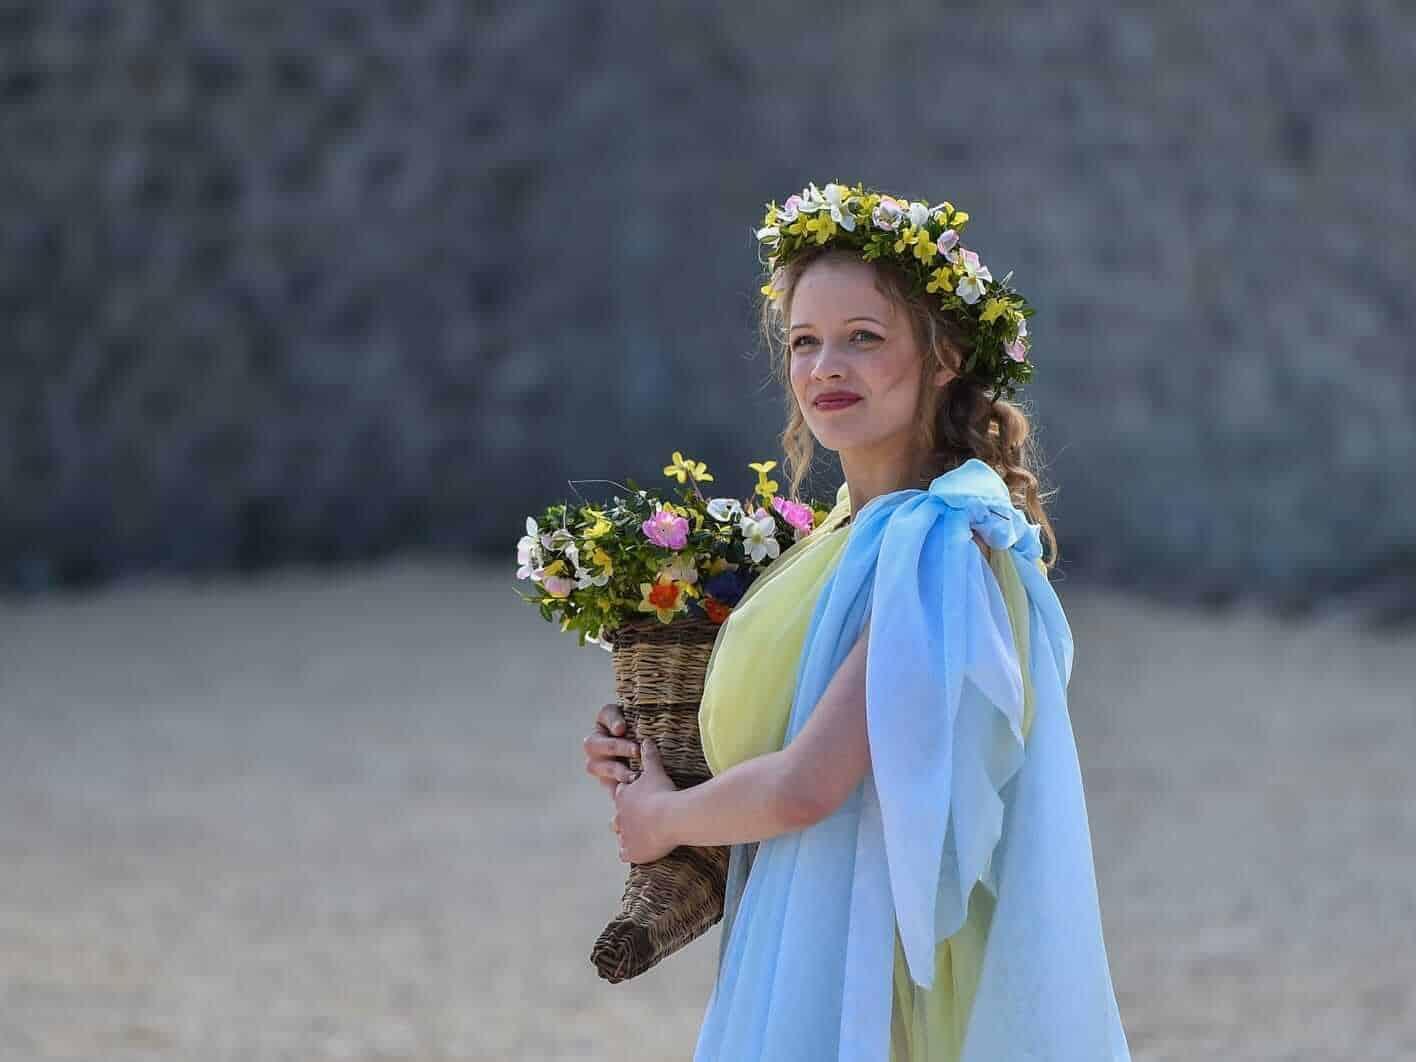 Woman during Floralia Roman Festival